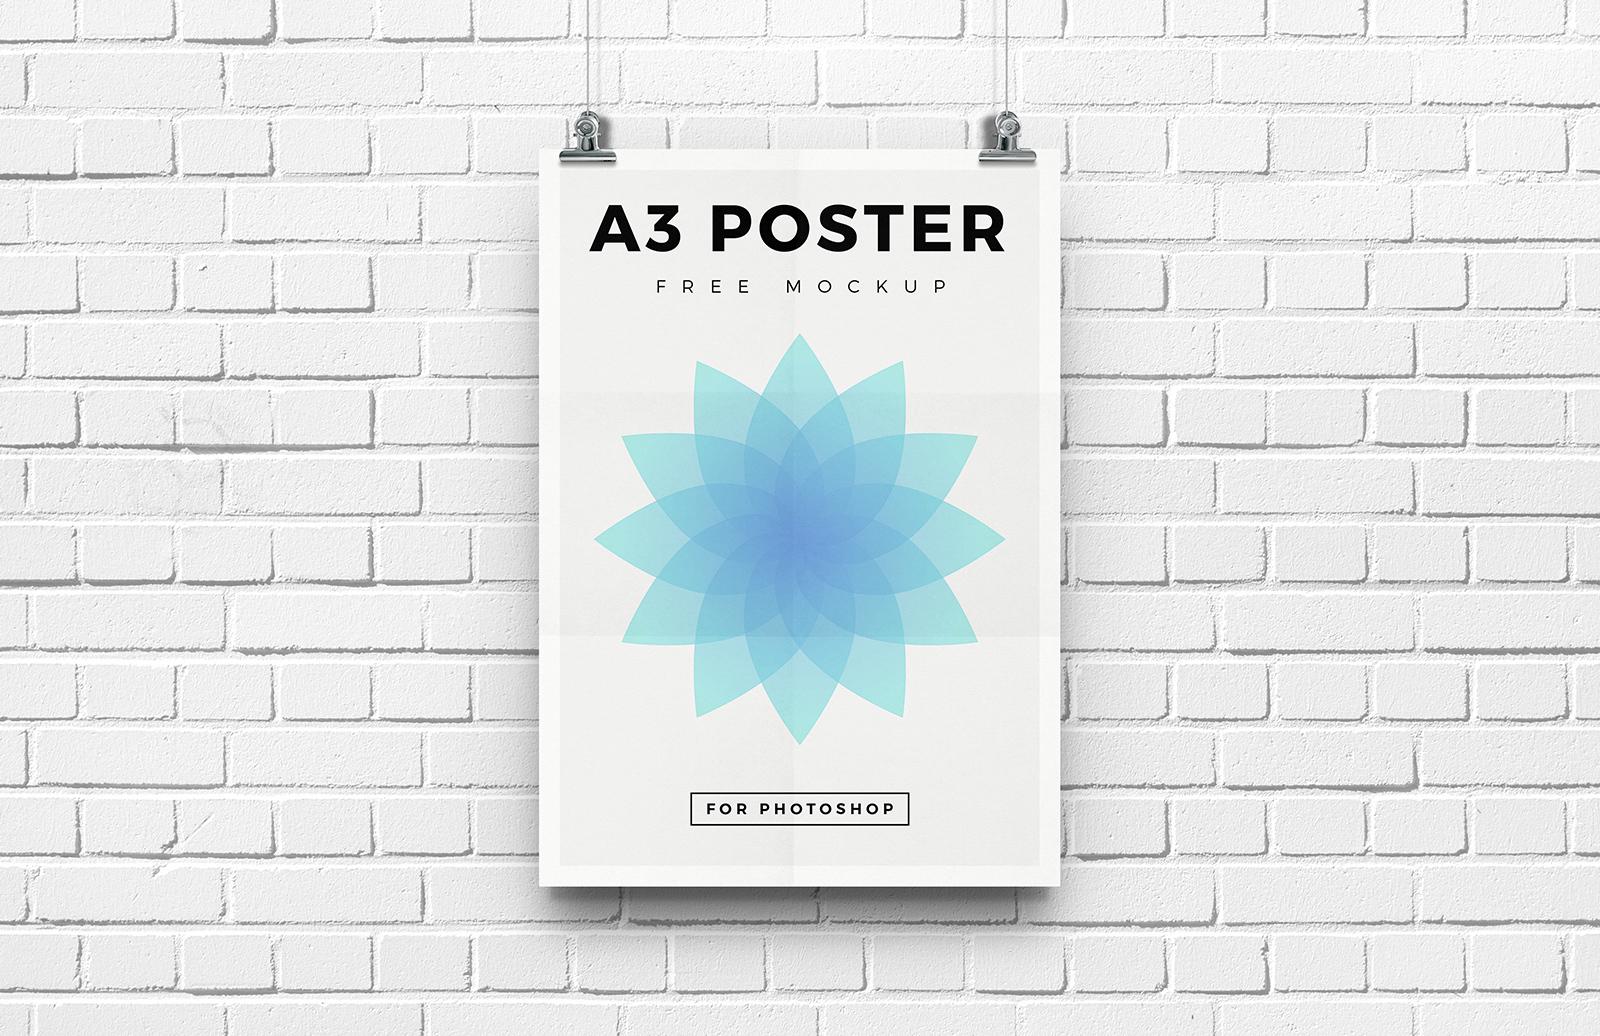 Free A3 Poster Mockup